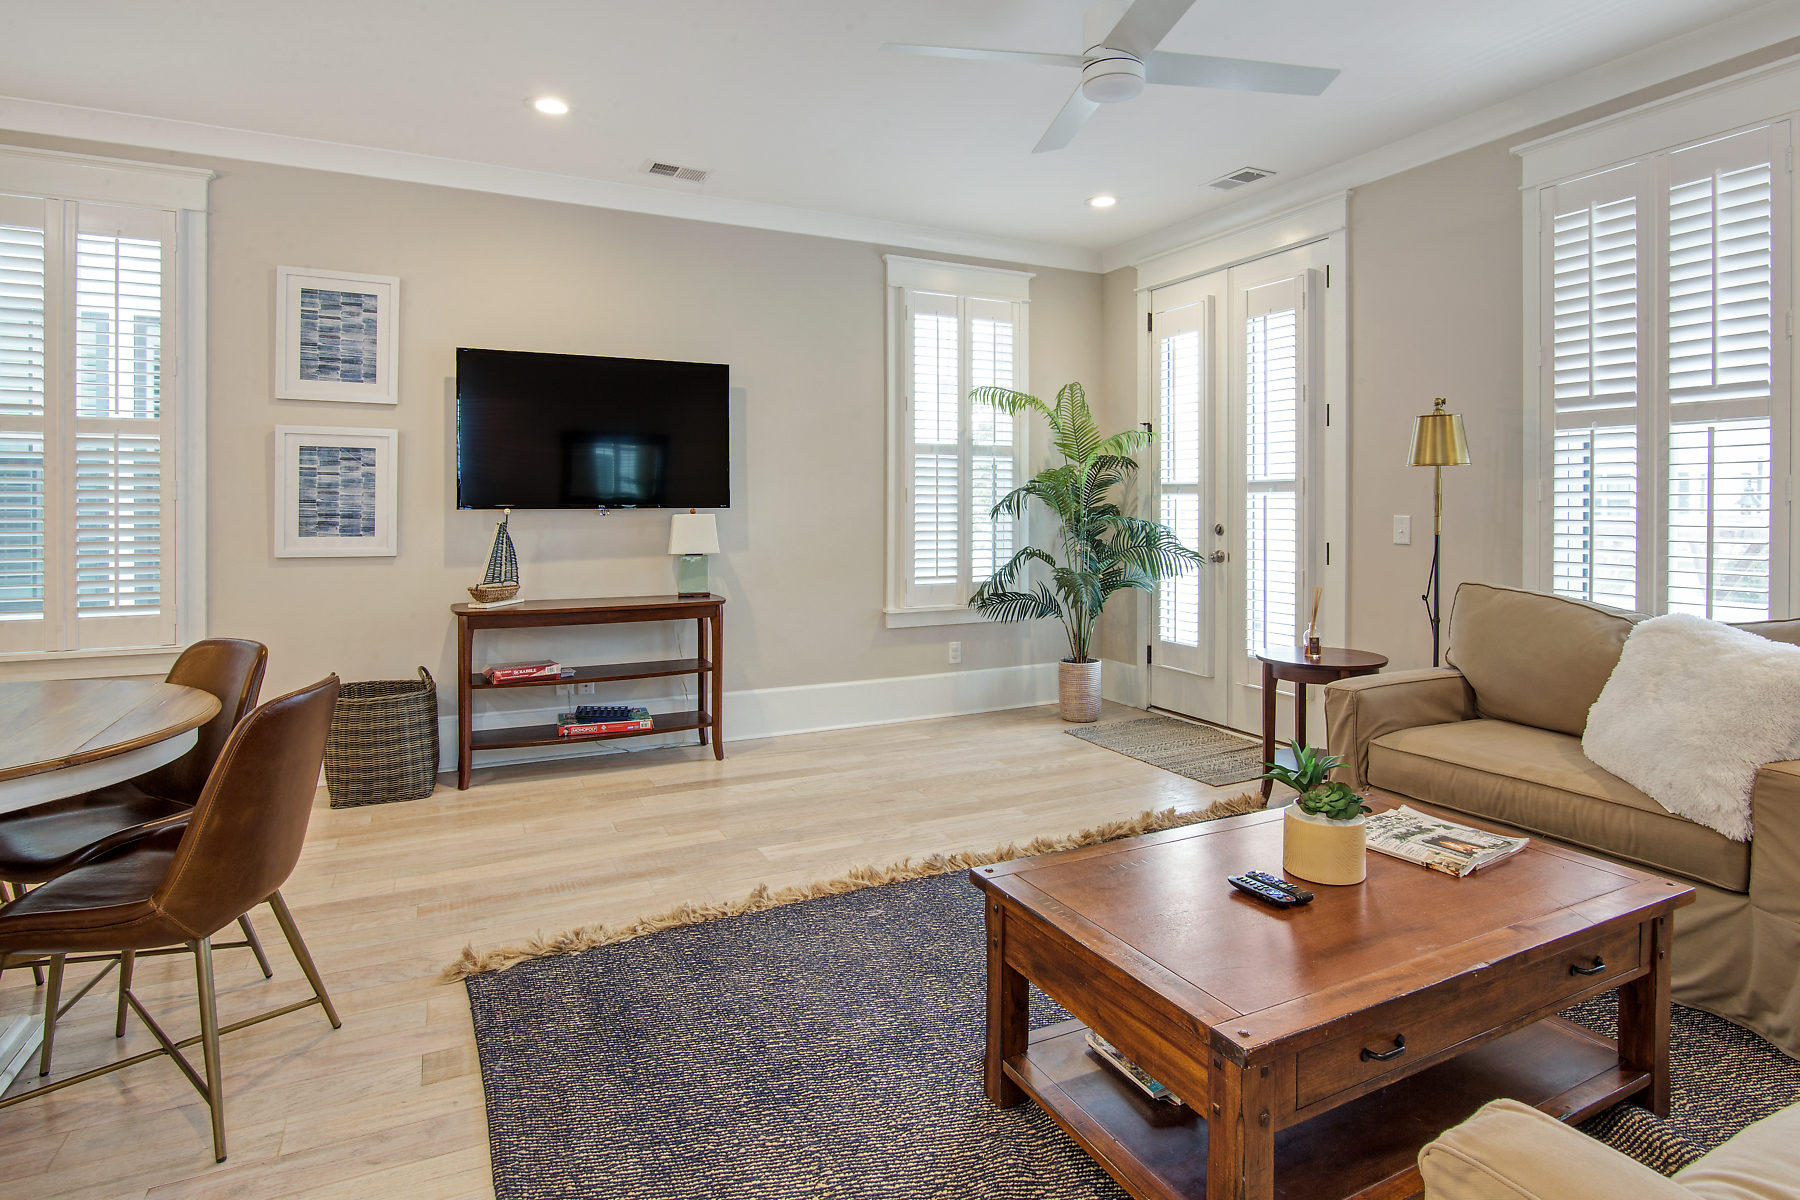 Sullivans Pointe Homes For Sale - 964 Key Colony, Mount Pleasant, SC - 11